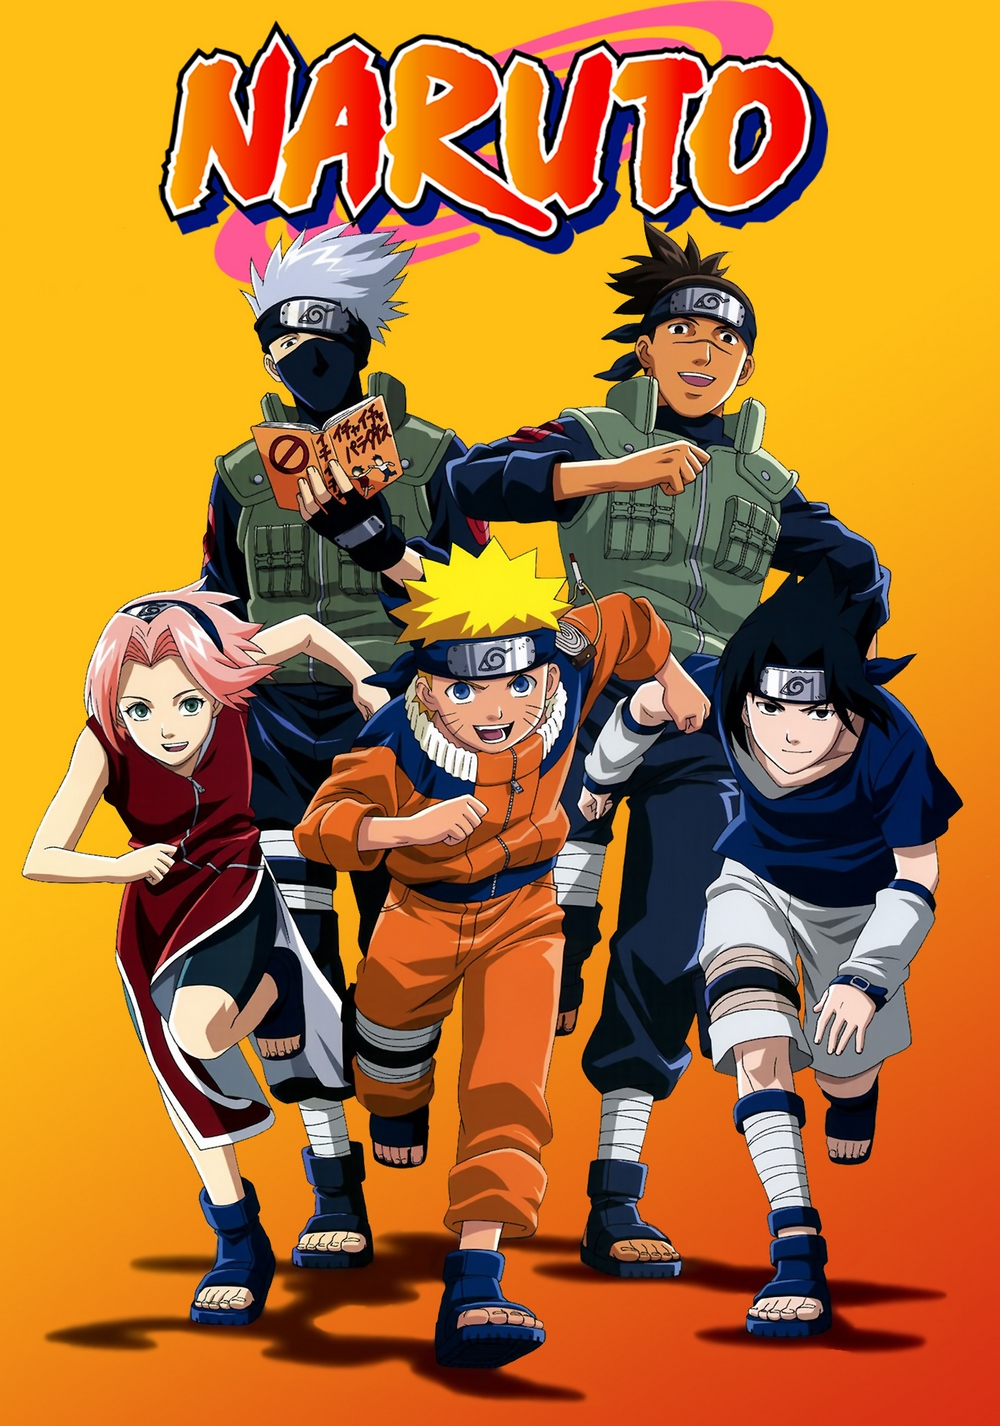 Naruto tv series download fztvseries